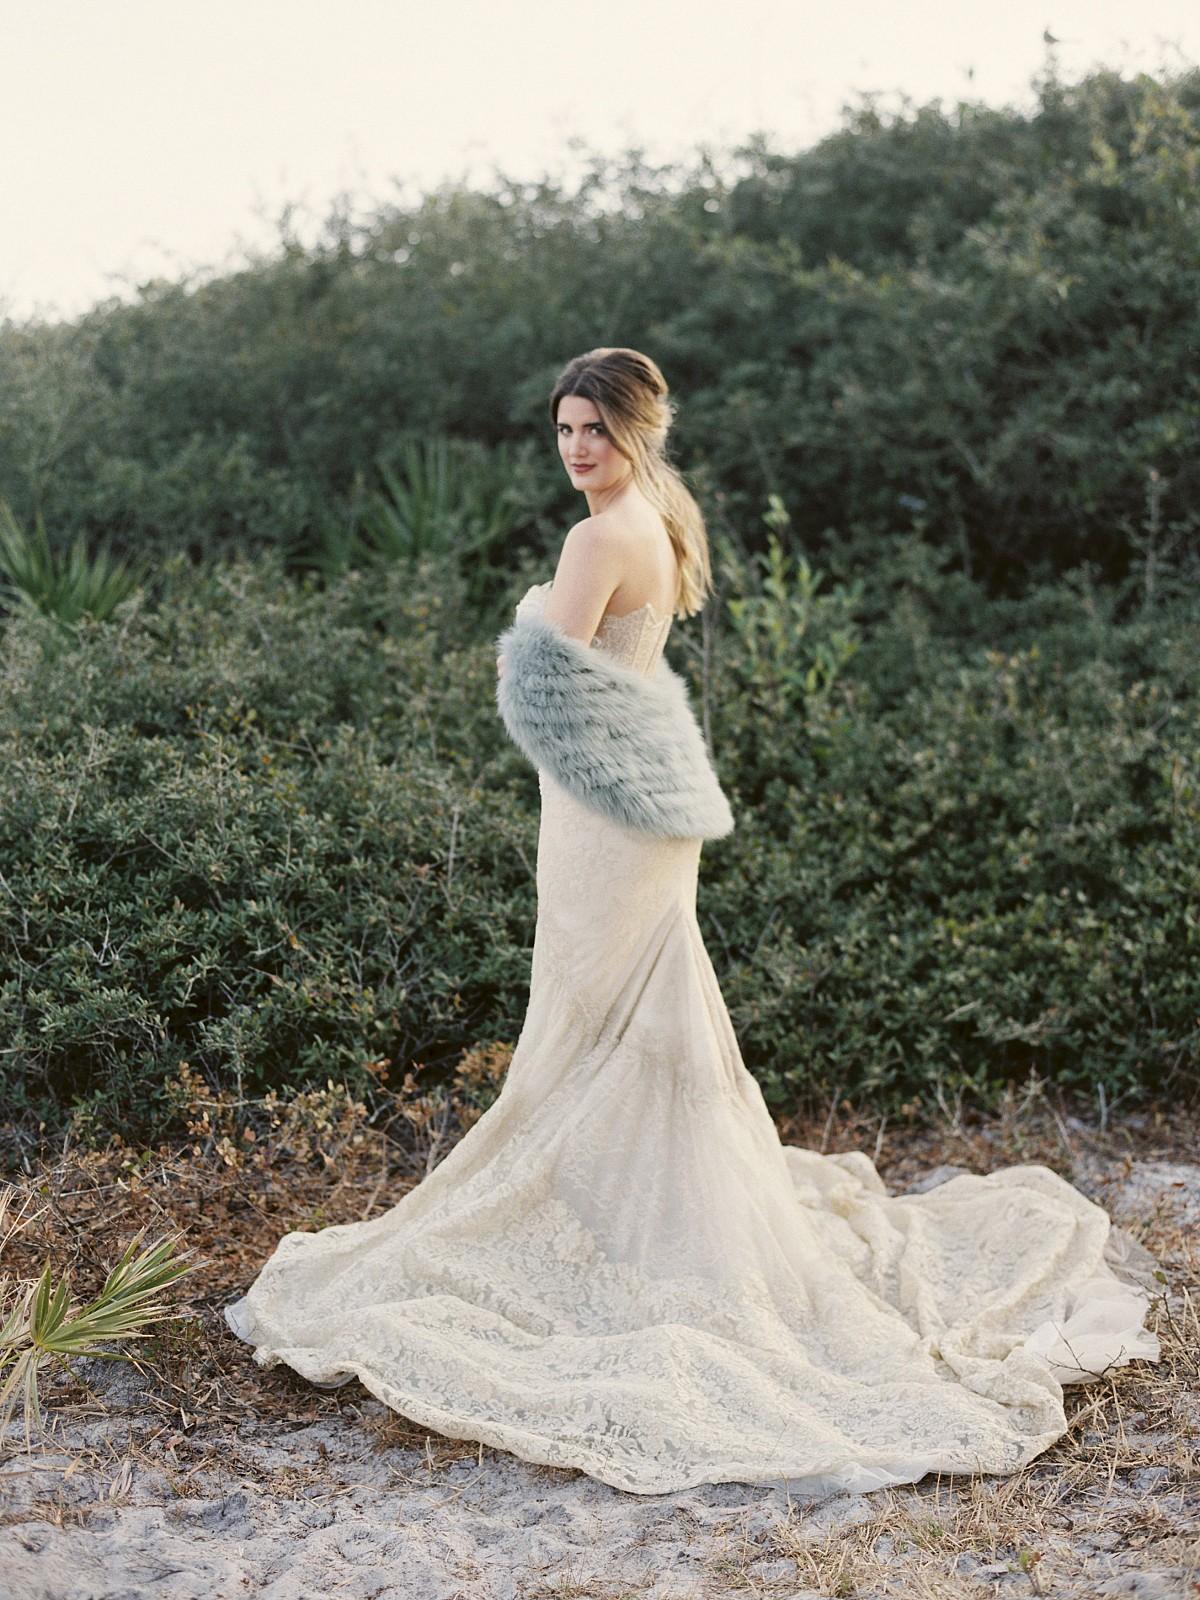 Opulent and Romantic Wedding Ideas